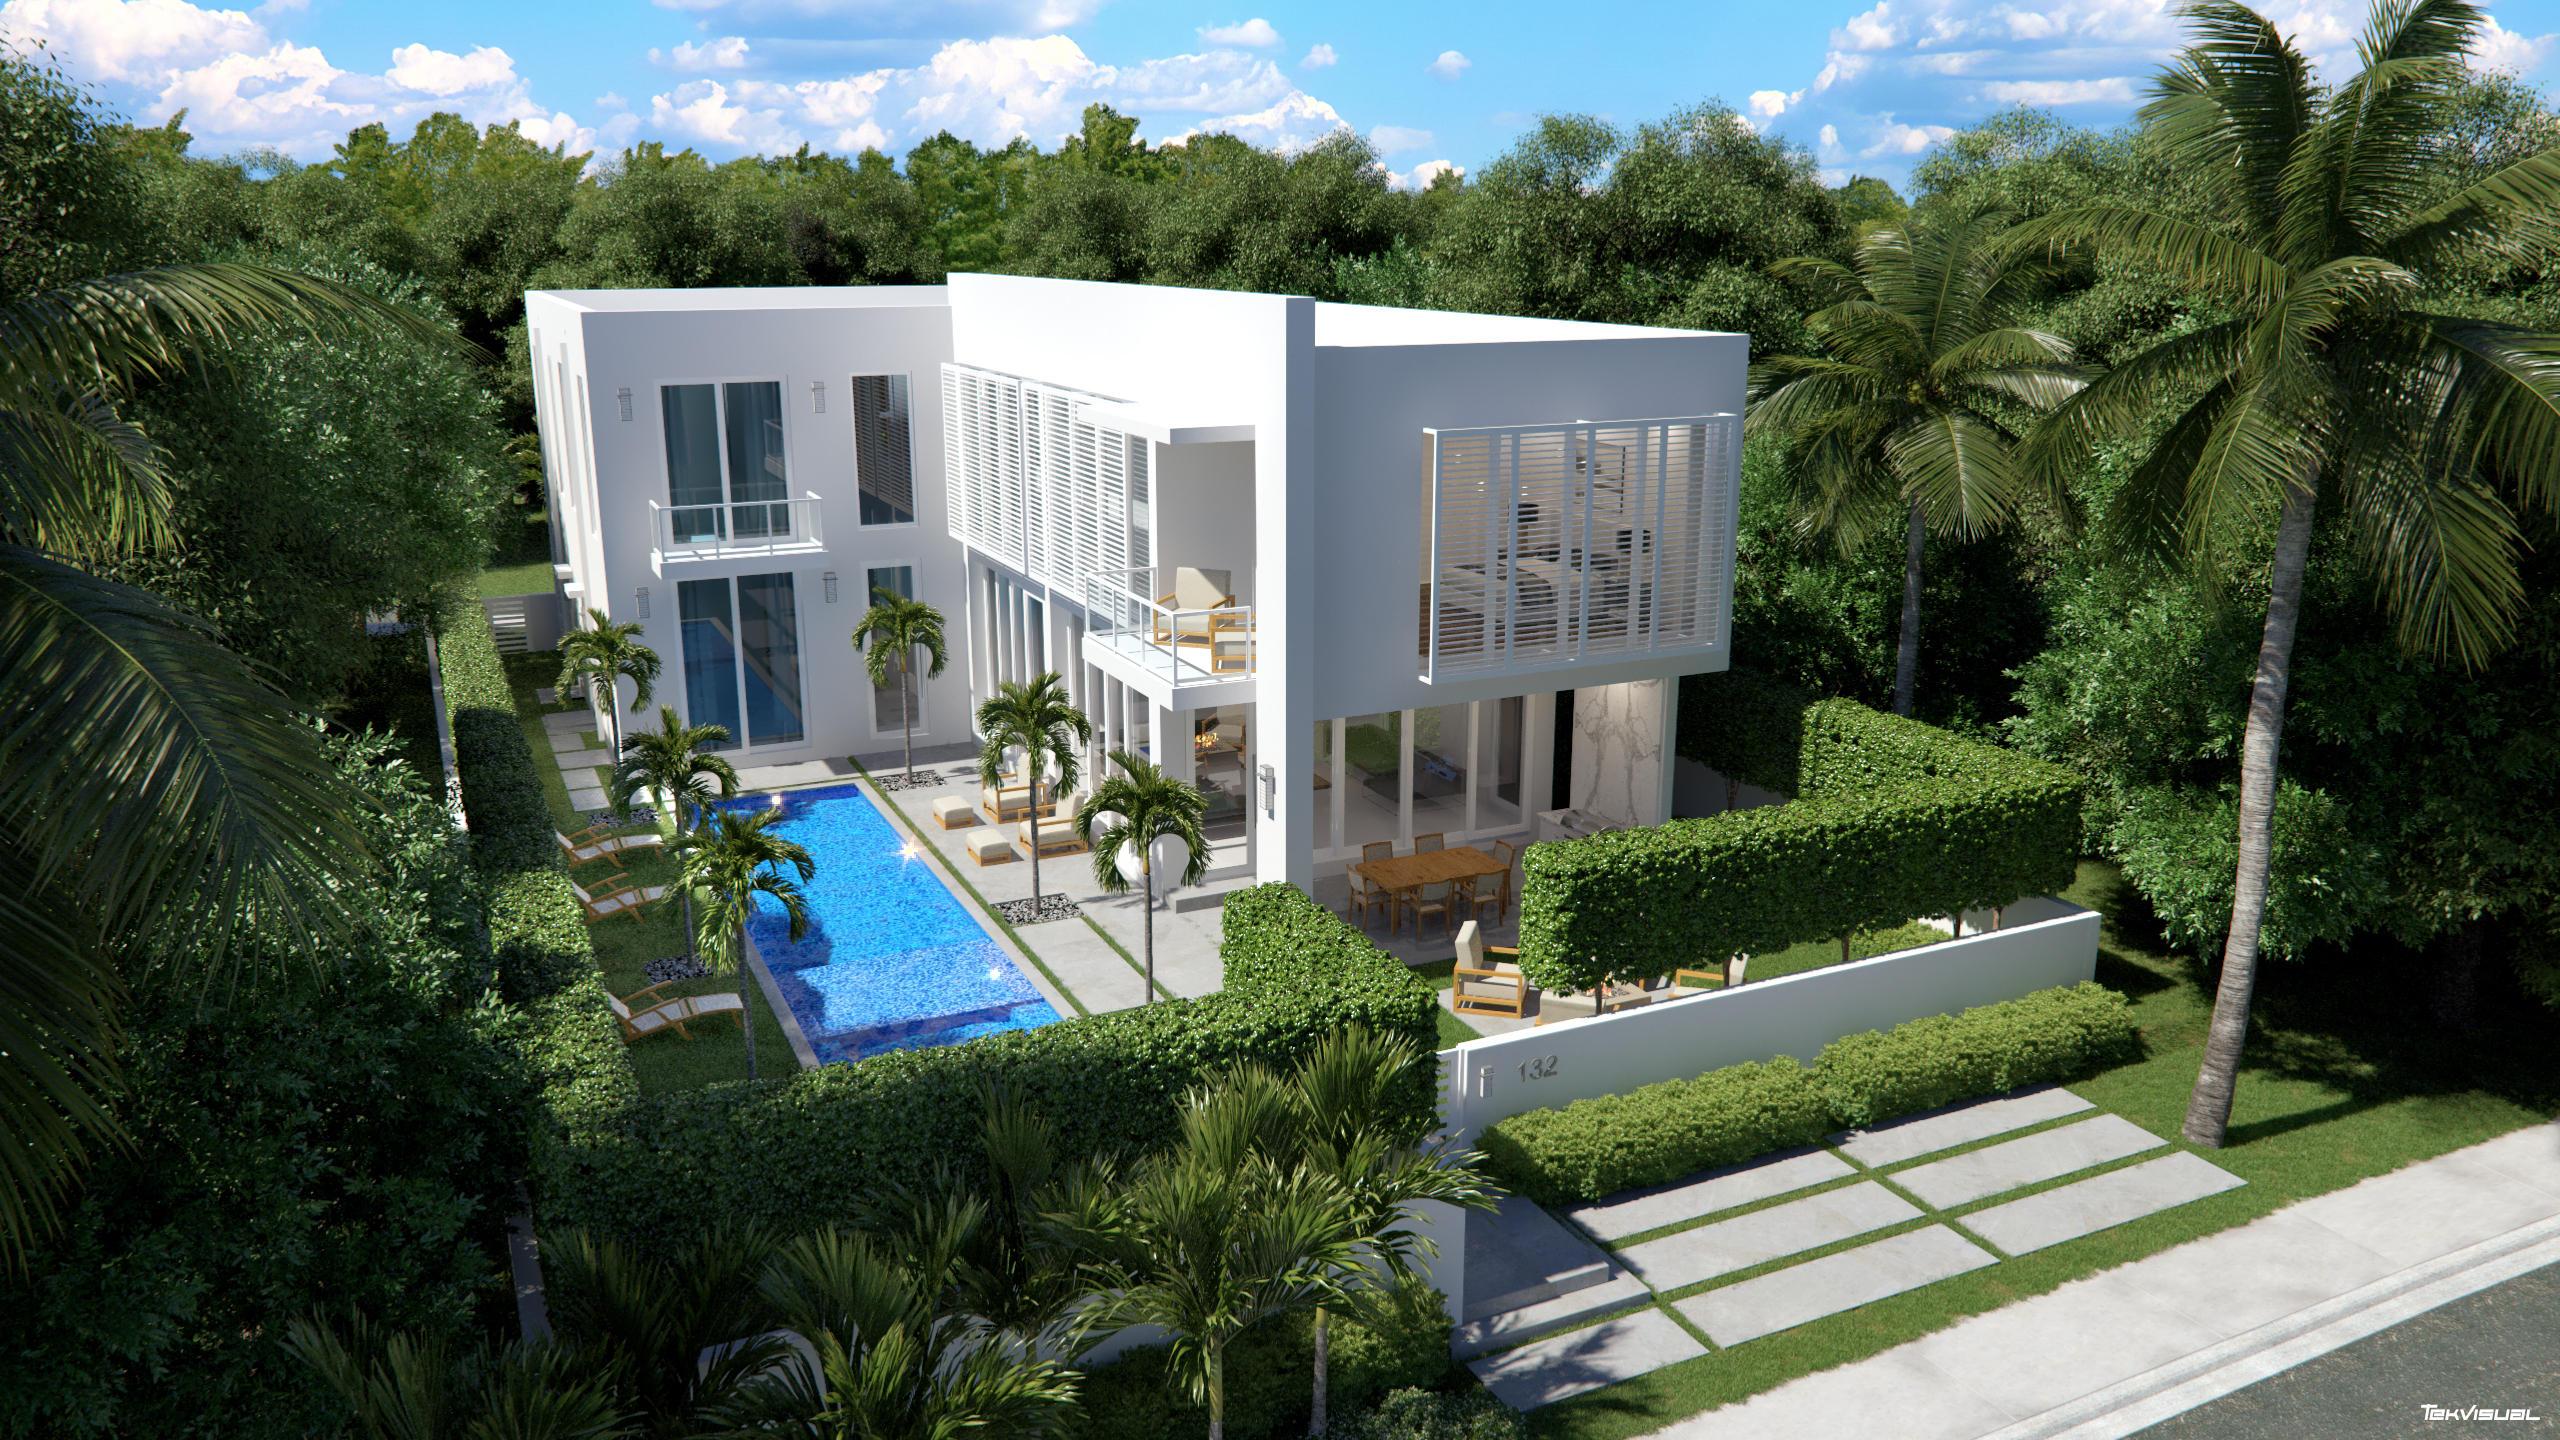 132 7th Avenue, Delray Beach, Florida 33483, 4 Bedrooms Bedrooms, ,4.1 BathroomsBathrooms,Single Family Detached,For Sale,7th,RX-10679286